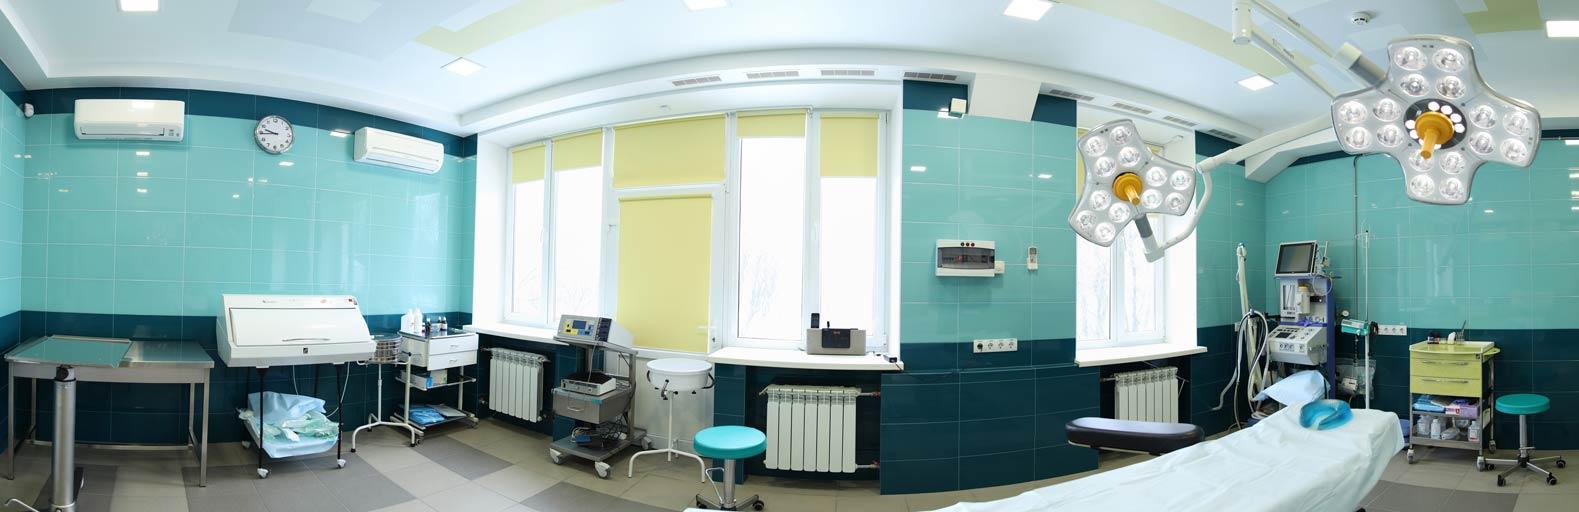 Операционная клиники Vidnova